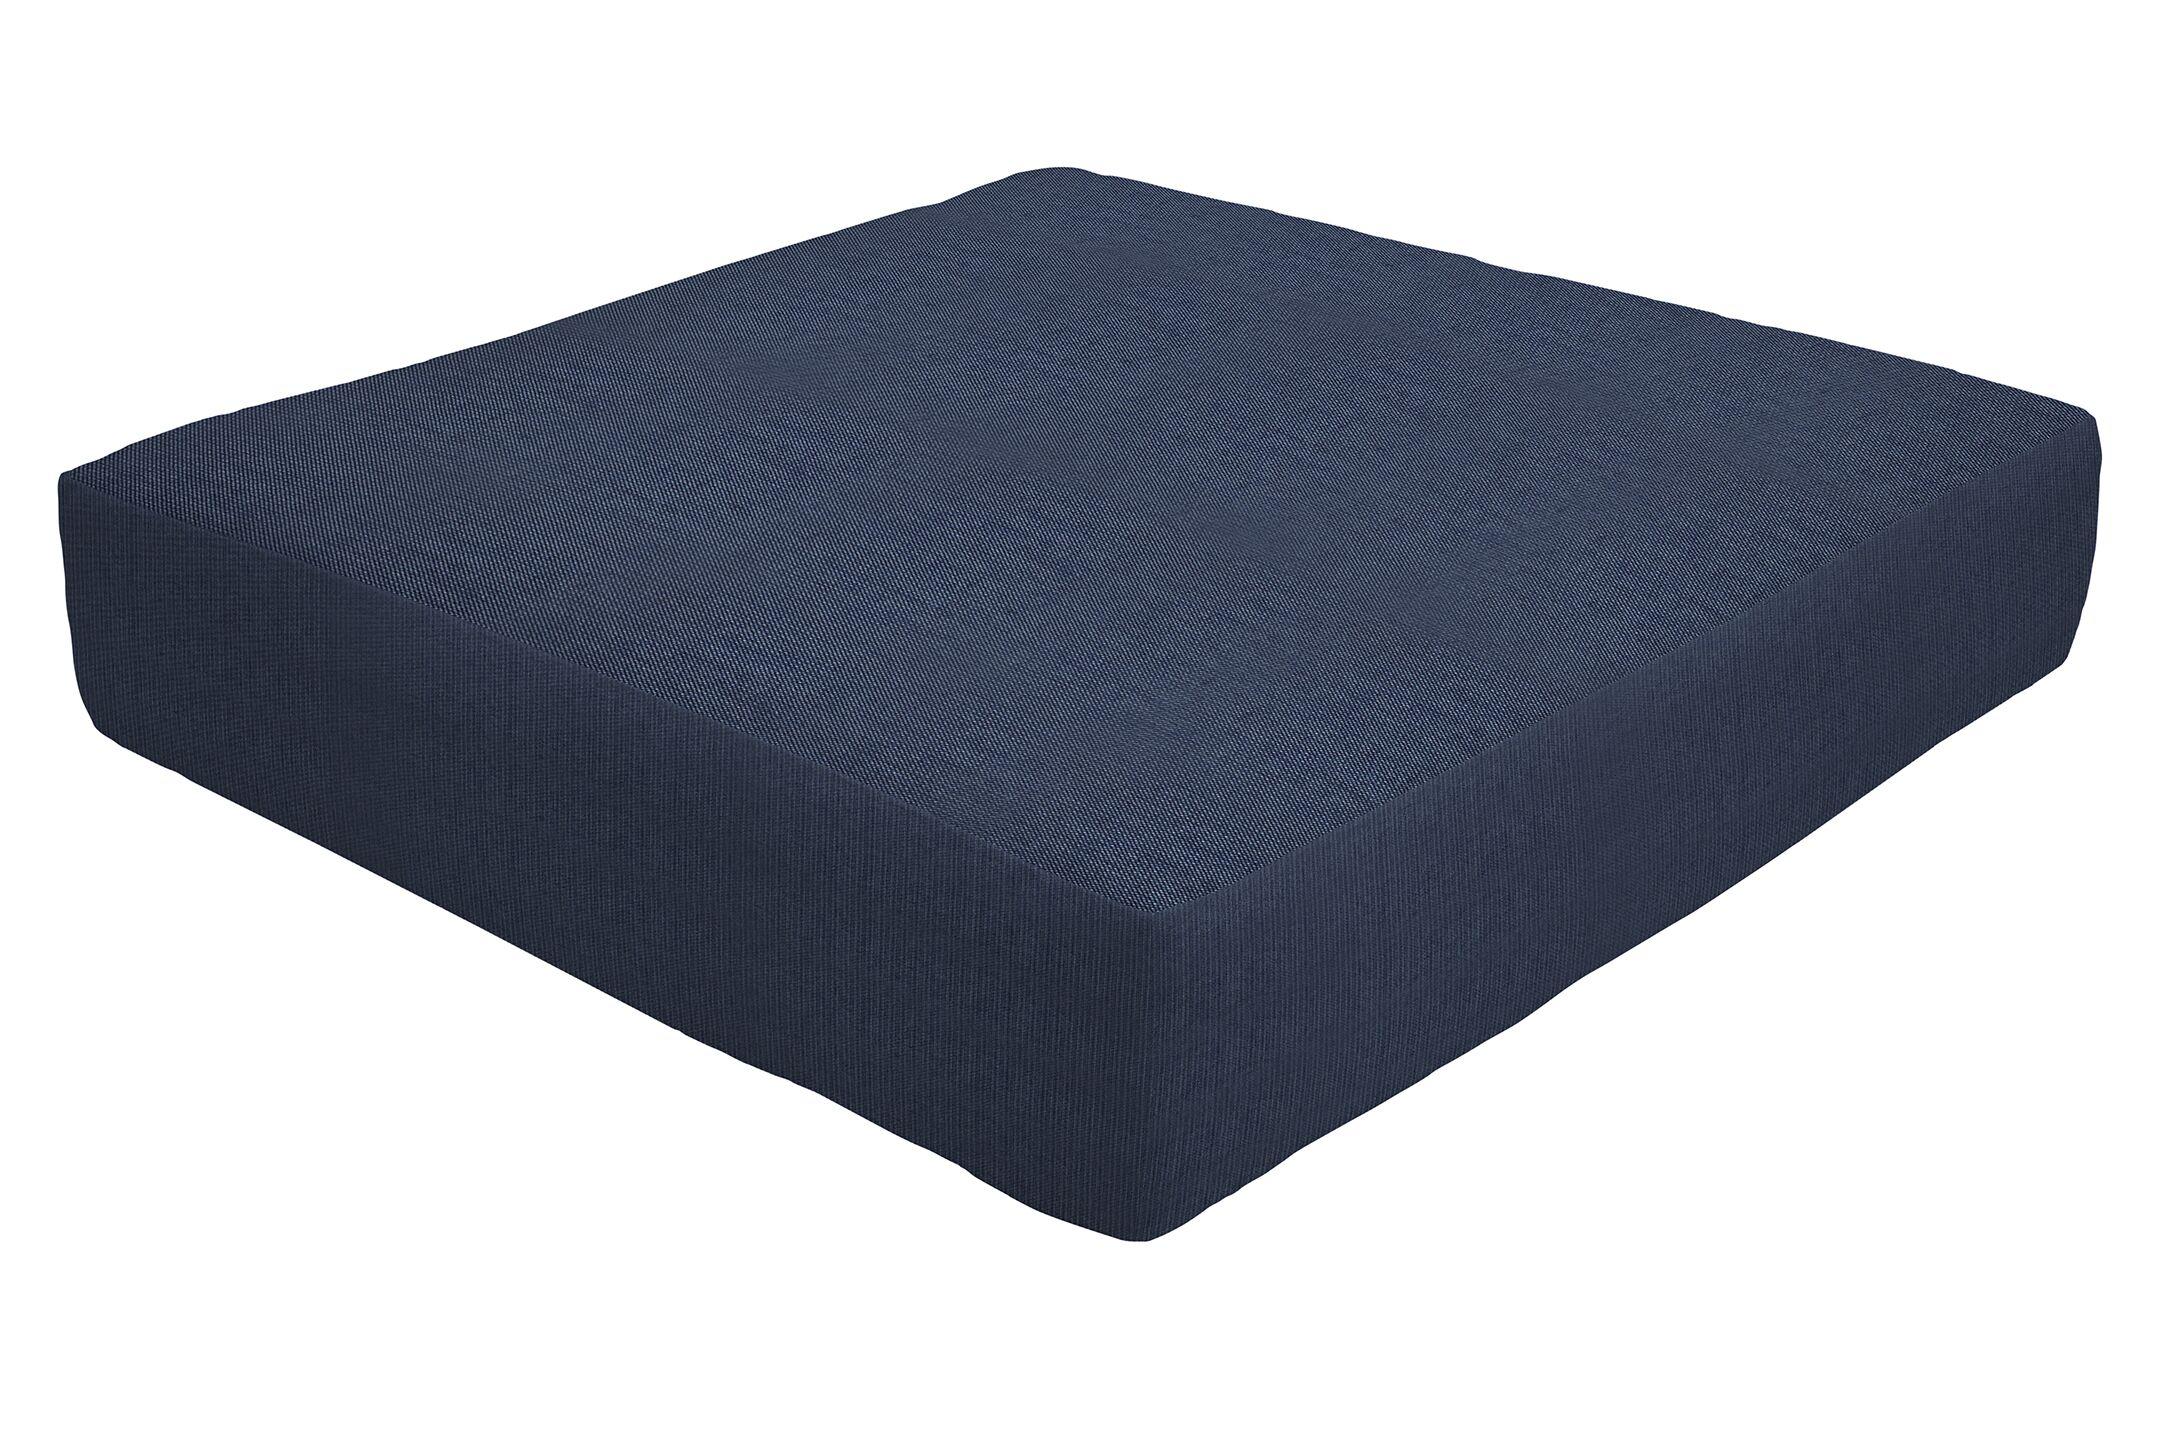 Knife Edge Indoor/Outdoor Sunbrella Ottoman Cushion Fabric: Indigo, Size: 5